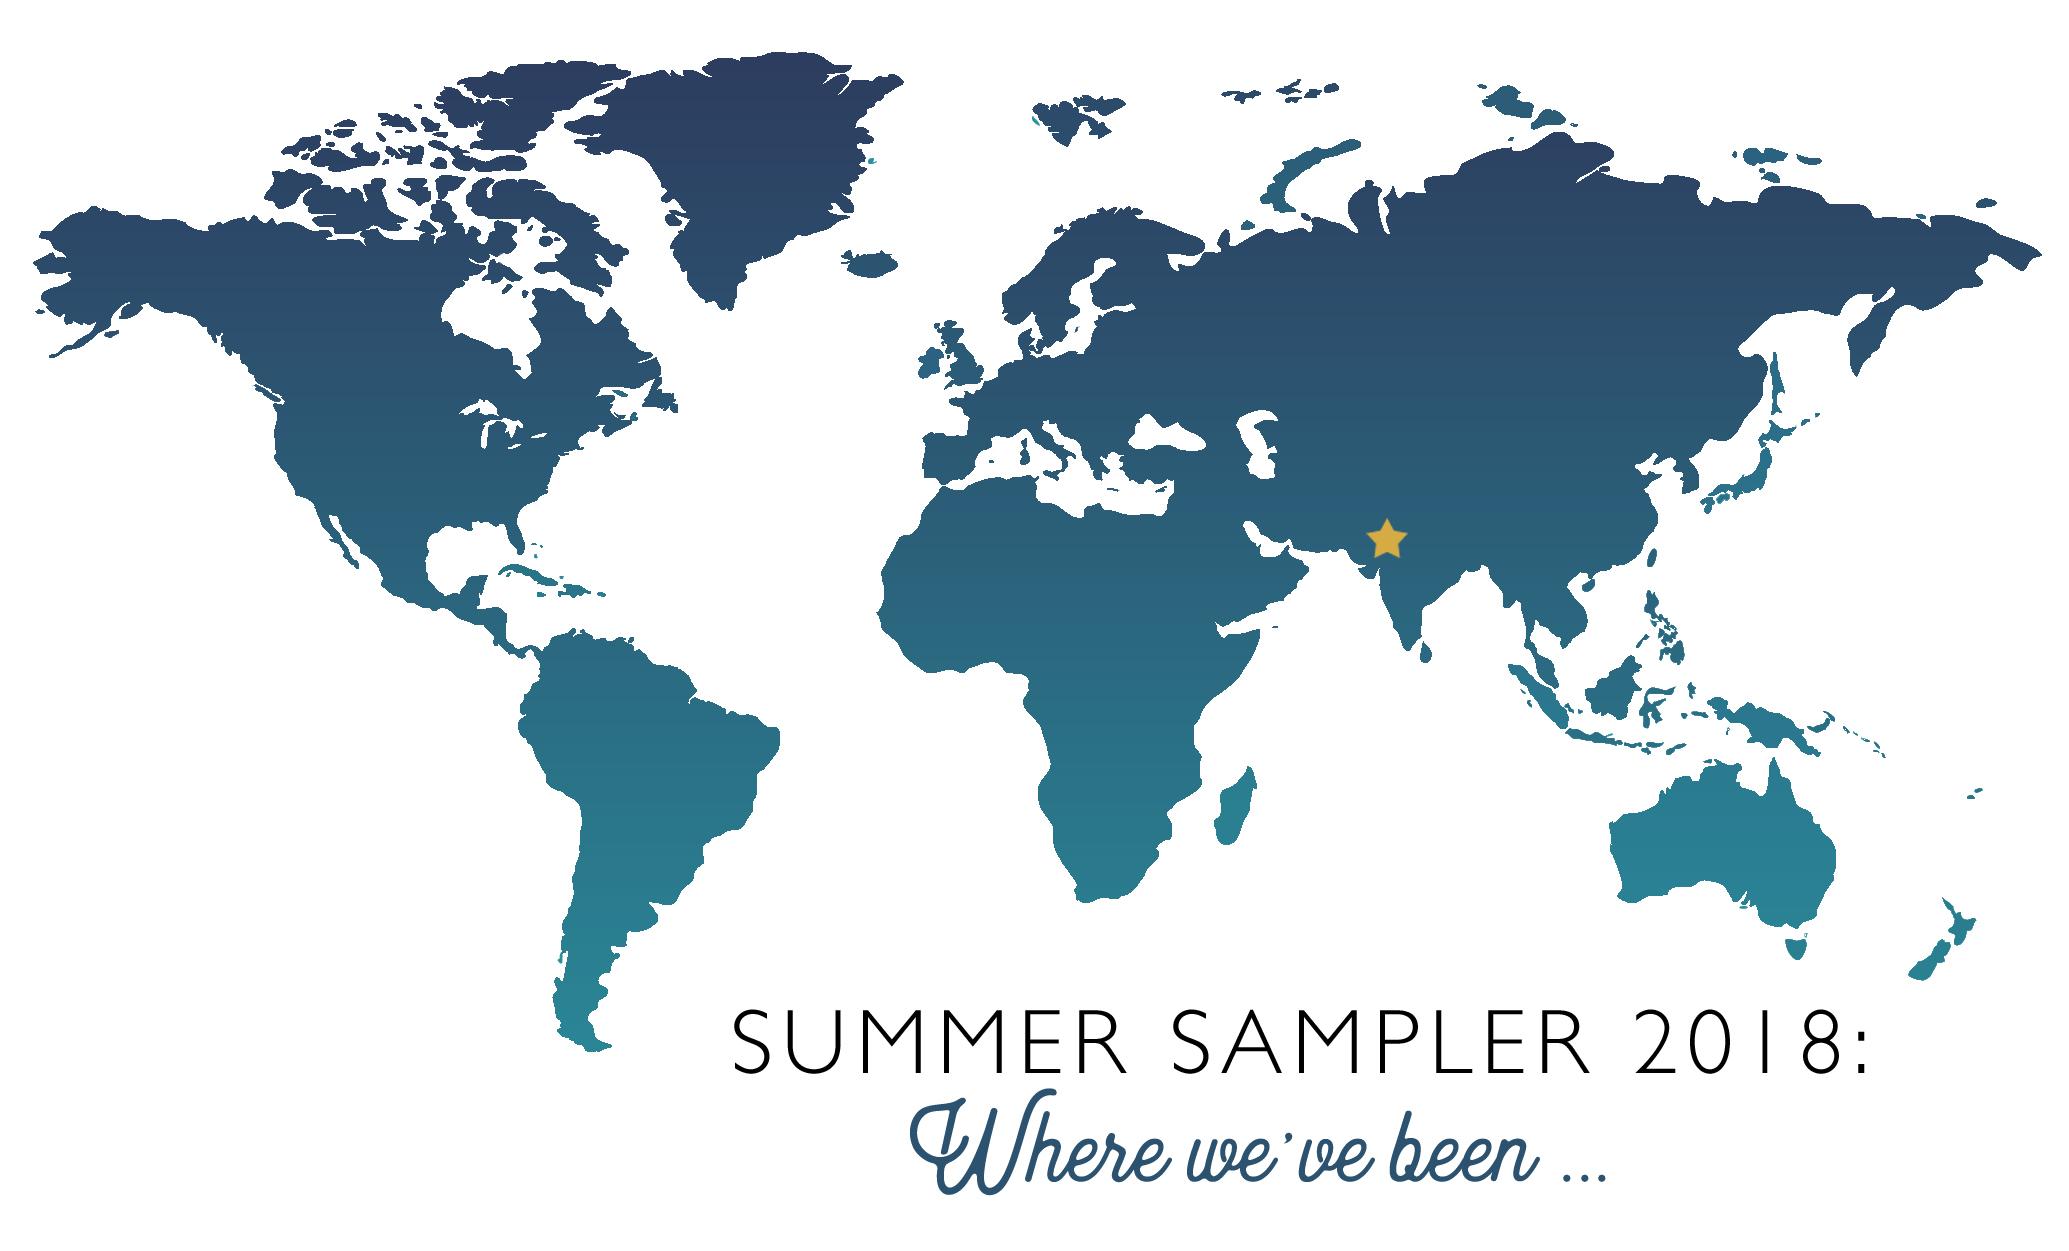 Summer Sampler 2018 - India